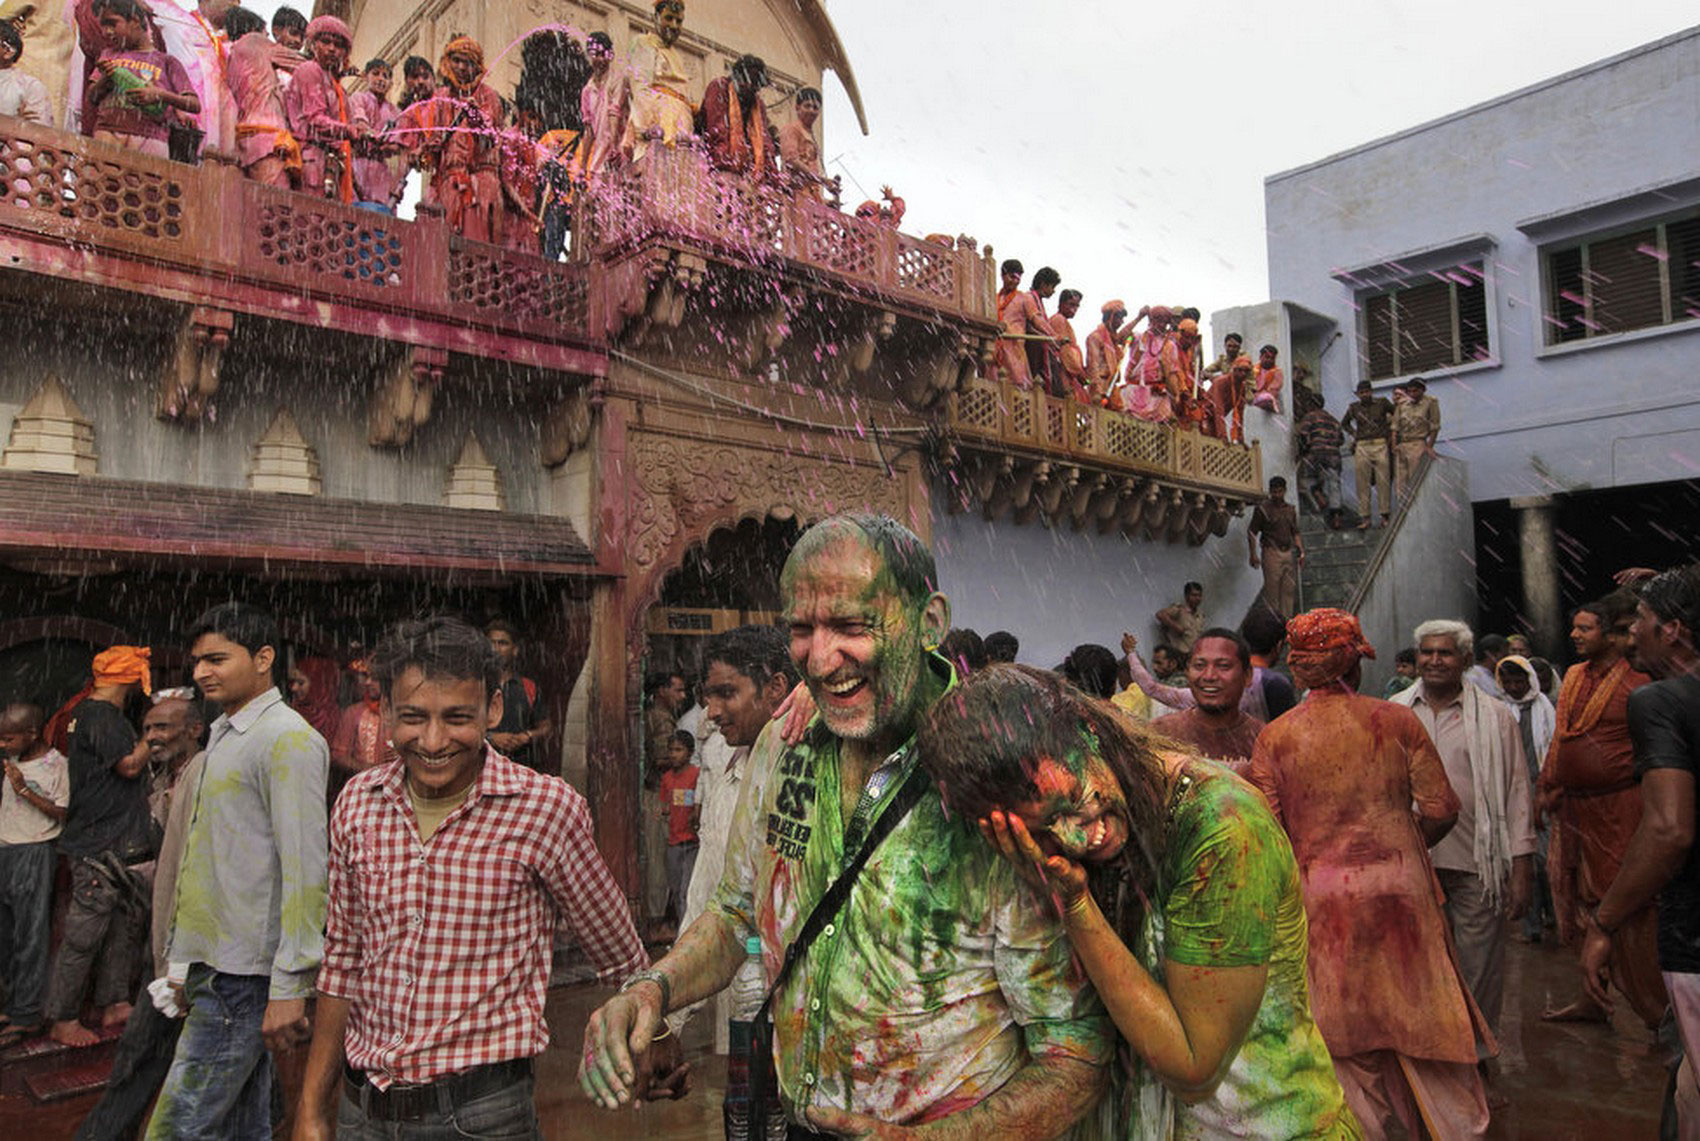 Обливание красками туристов во время Холи